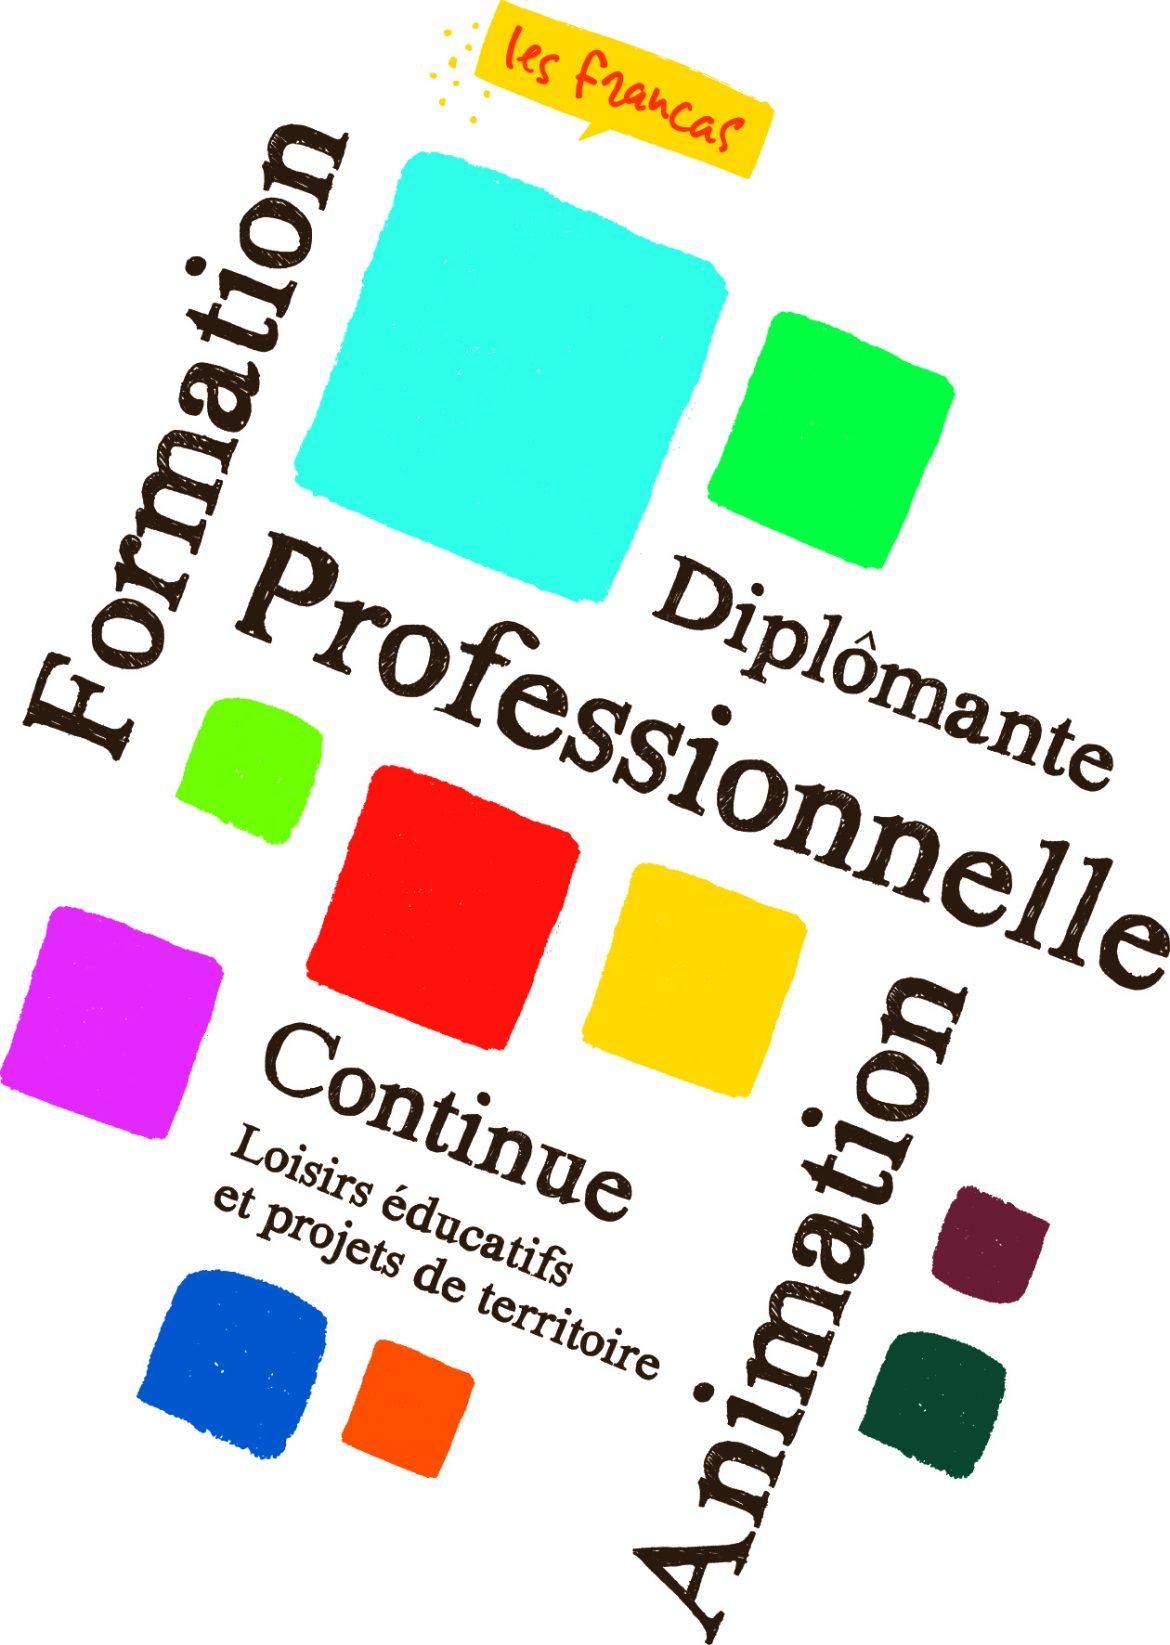 Réunions d'information collective sur les formations BAFA/BAFD/CPJEPS/BPJPES/DEJEPS/DESJEPS...